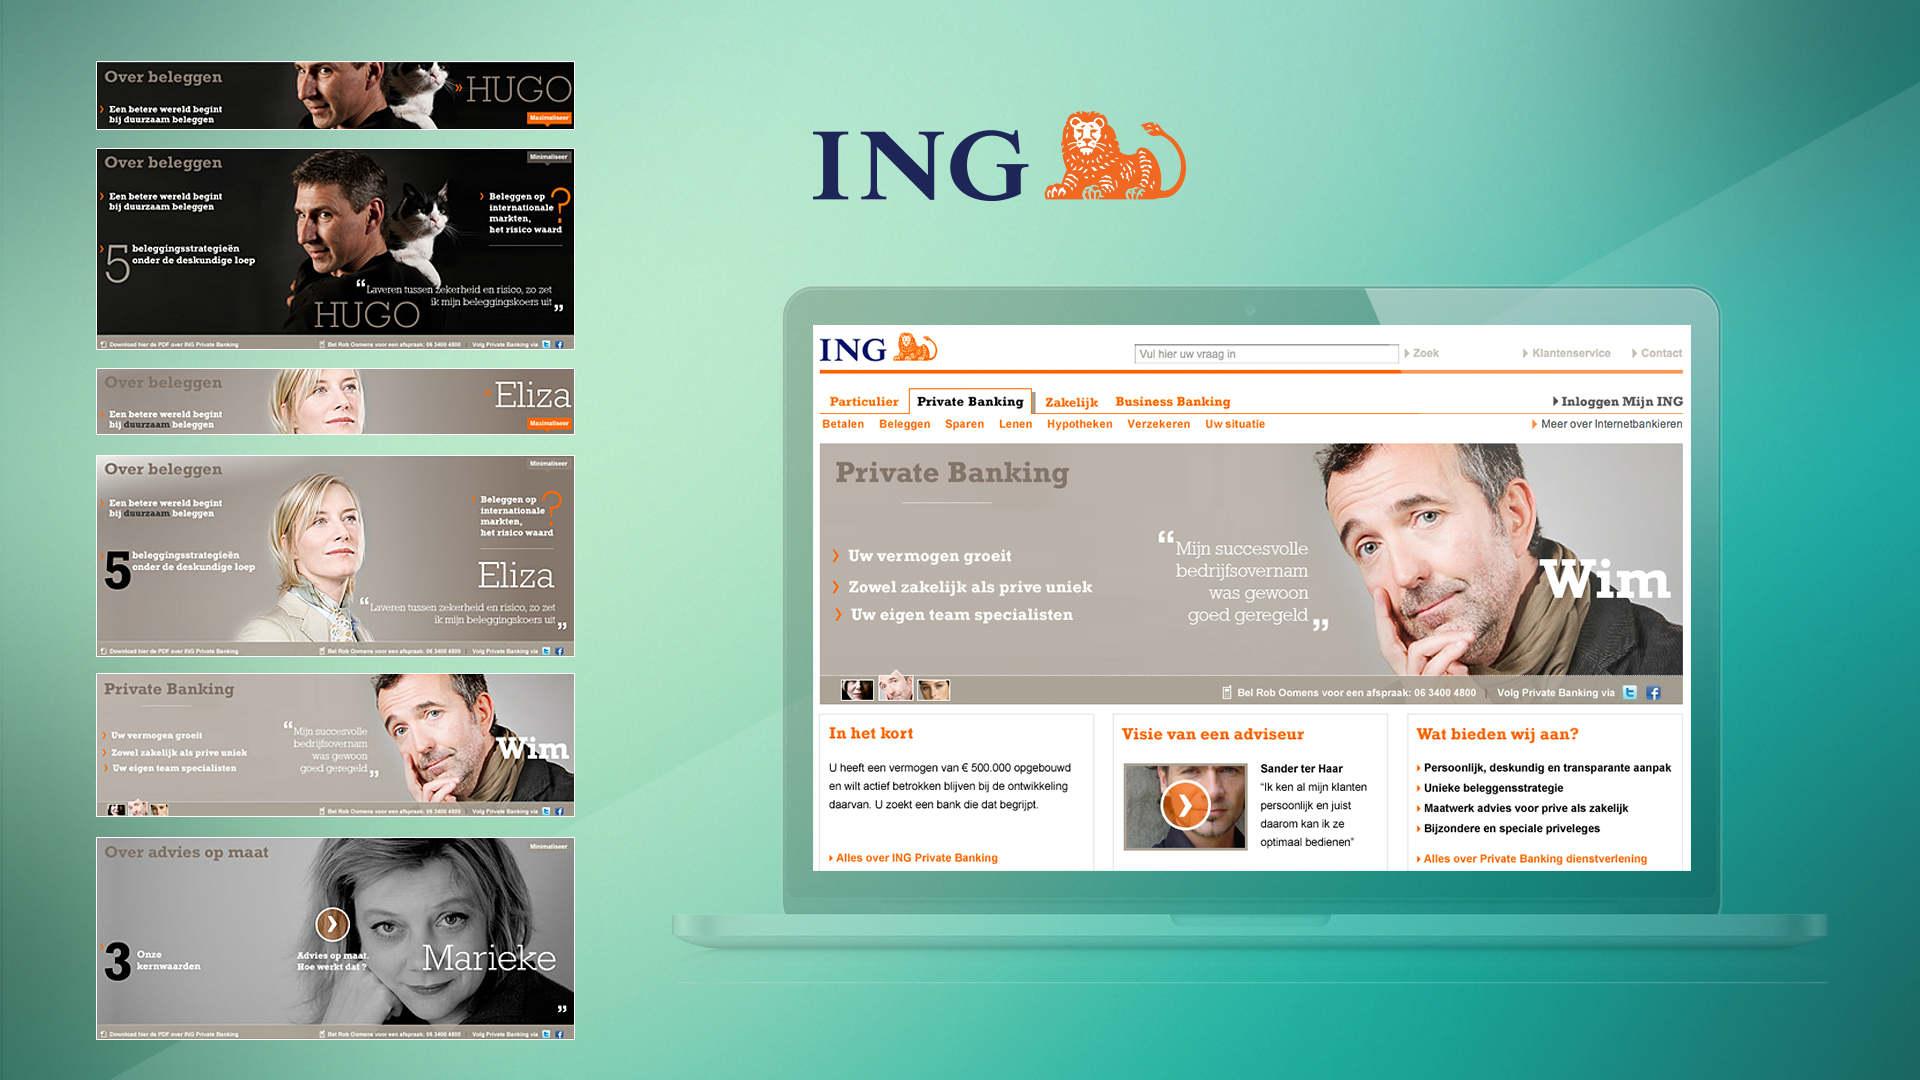 ING. Case. Visuals pitch, concept, art direction, creative consultancy, workshop concept, design. Sham Ramessar